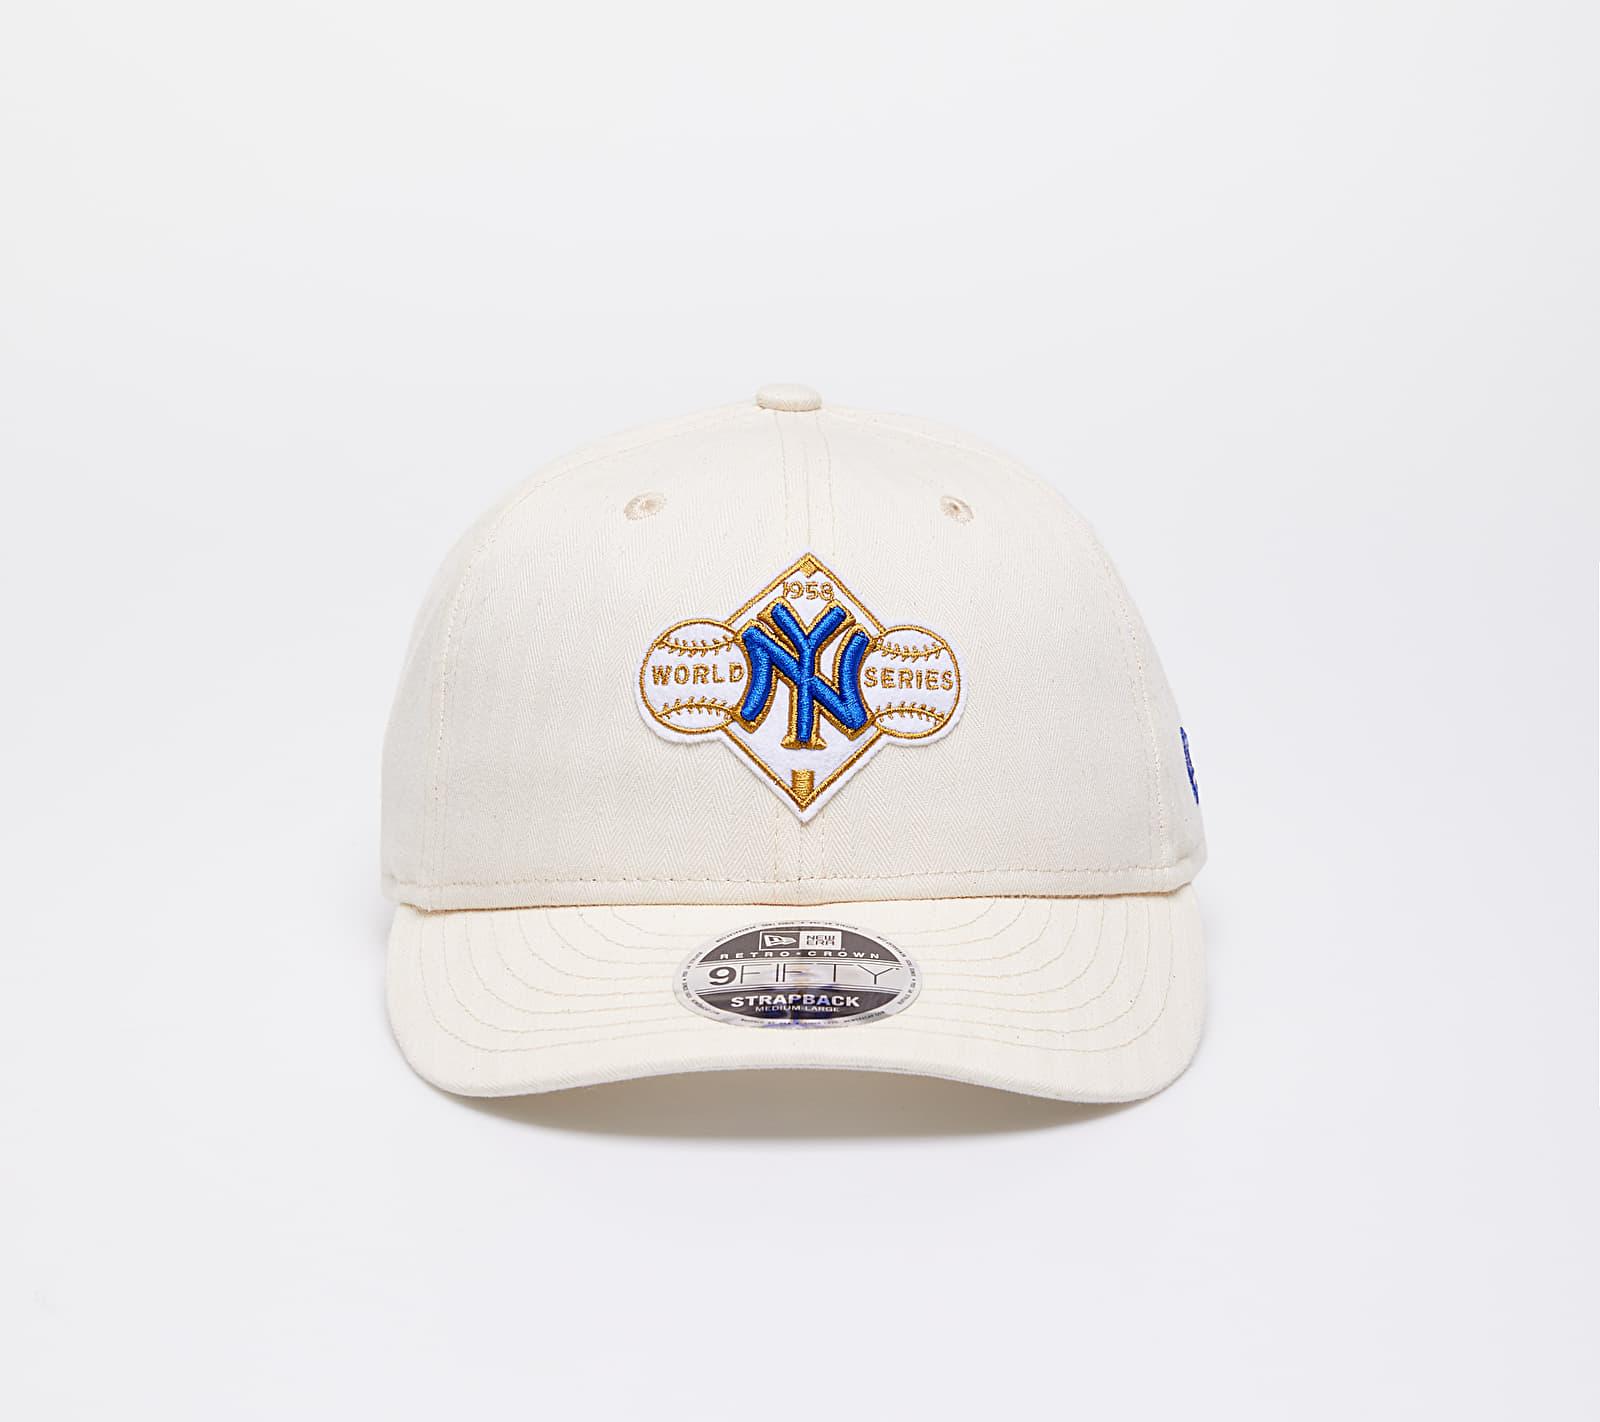 New Era 9Fifty MLB Cooperstown New York Yankees Hat Cream S-M